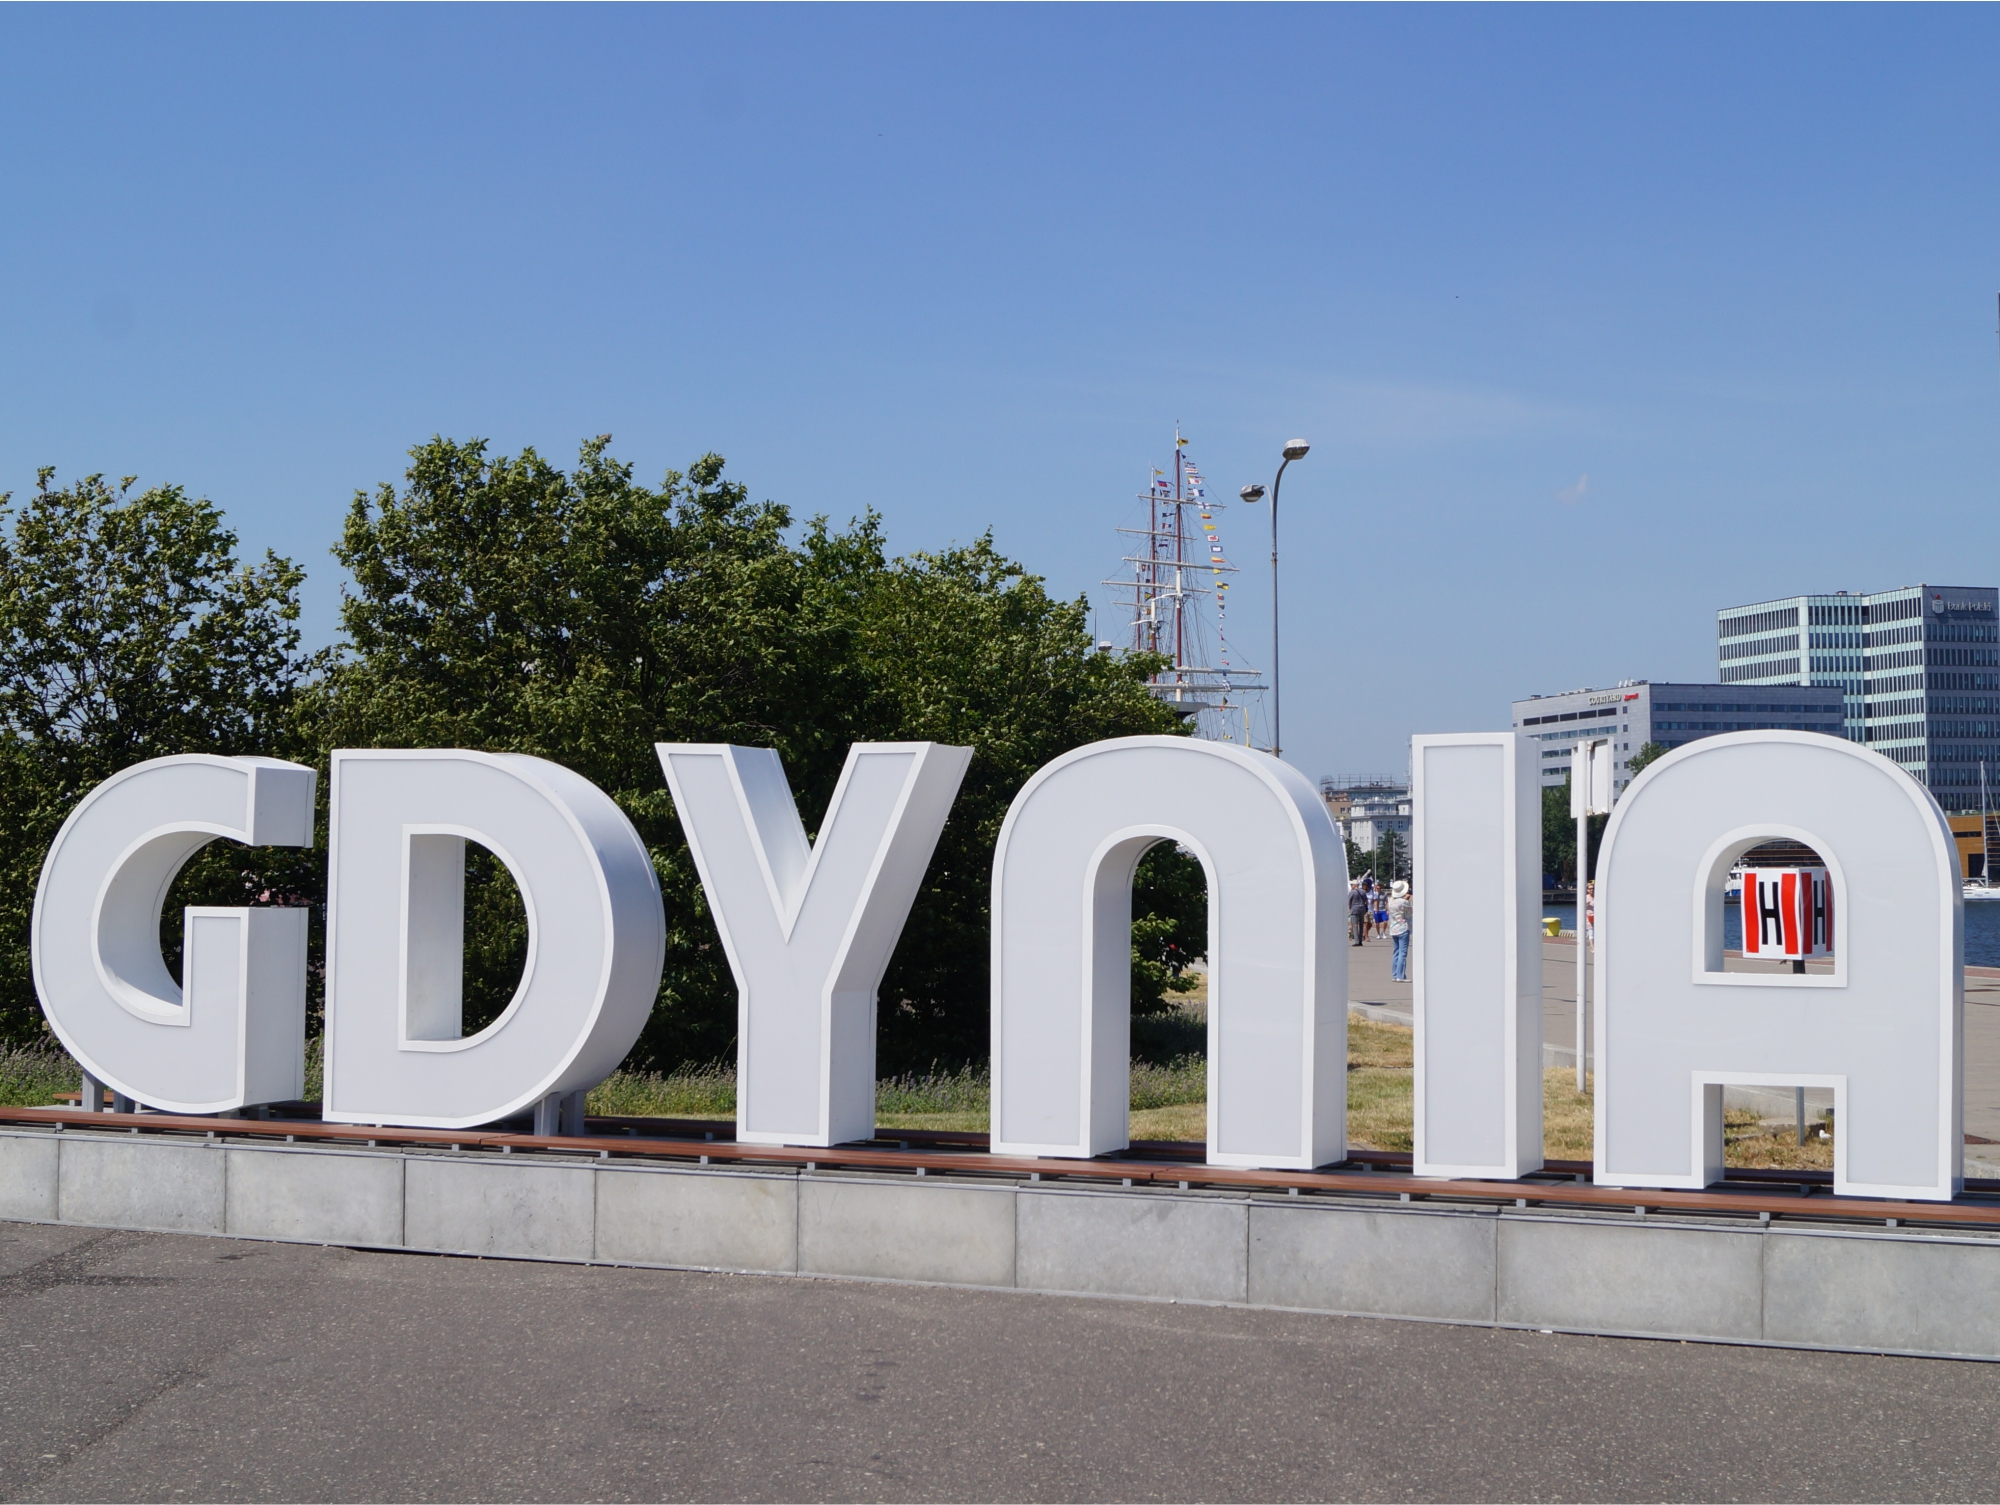 IRONMAN Gdynia | Übernachtung Apartment | 04.-14.08.2021